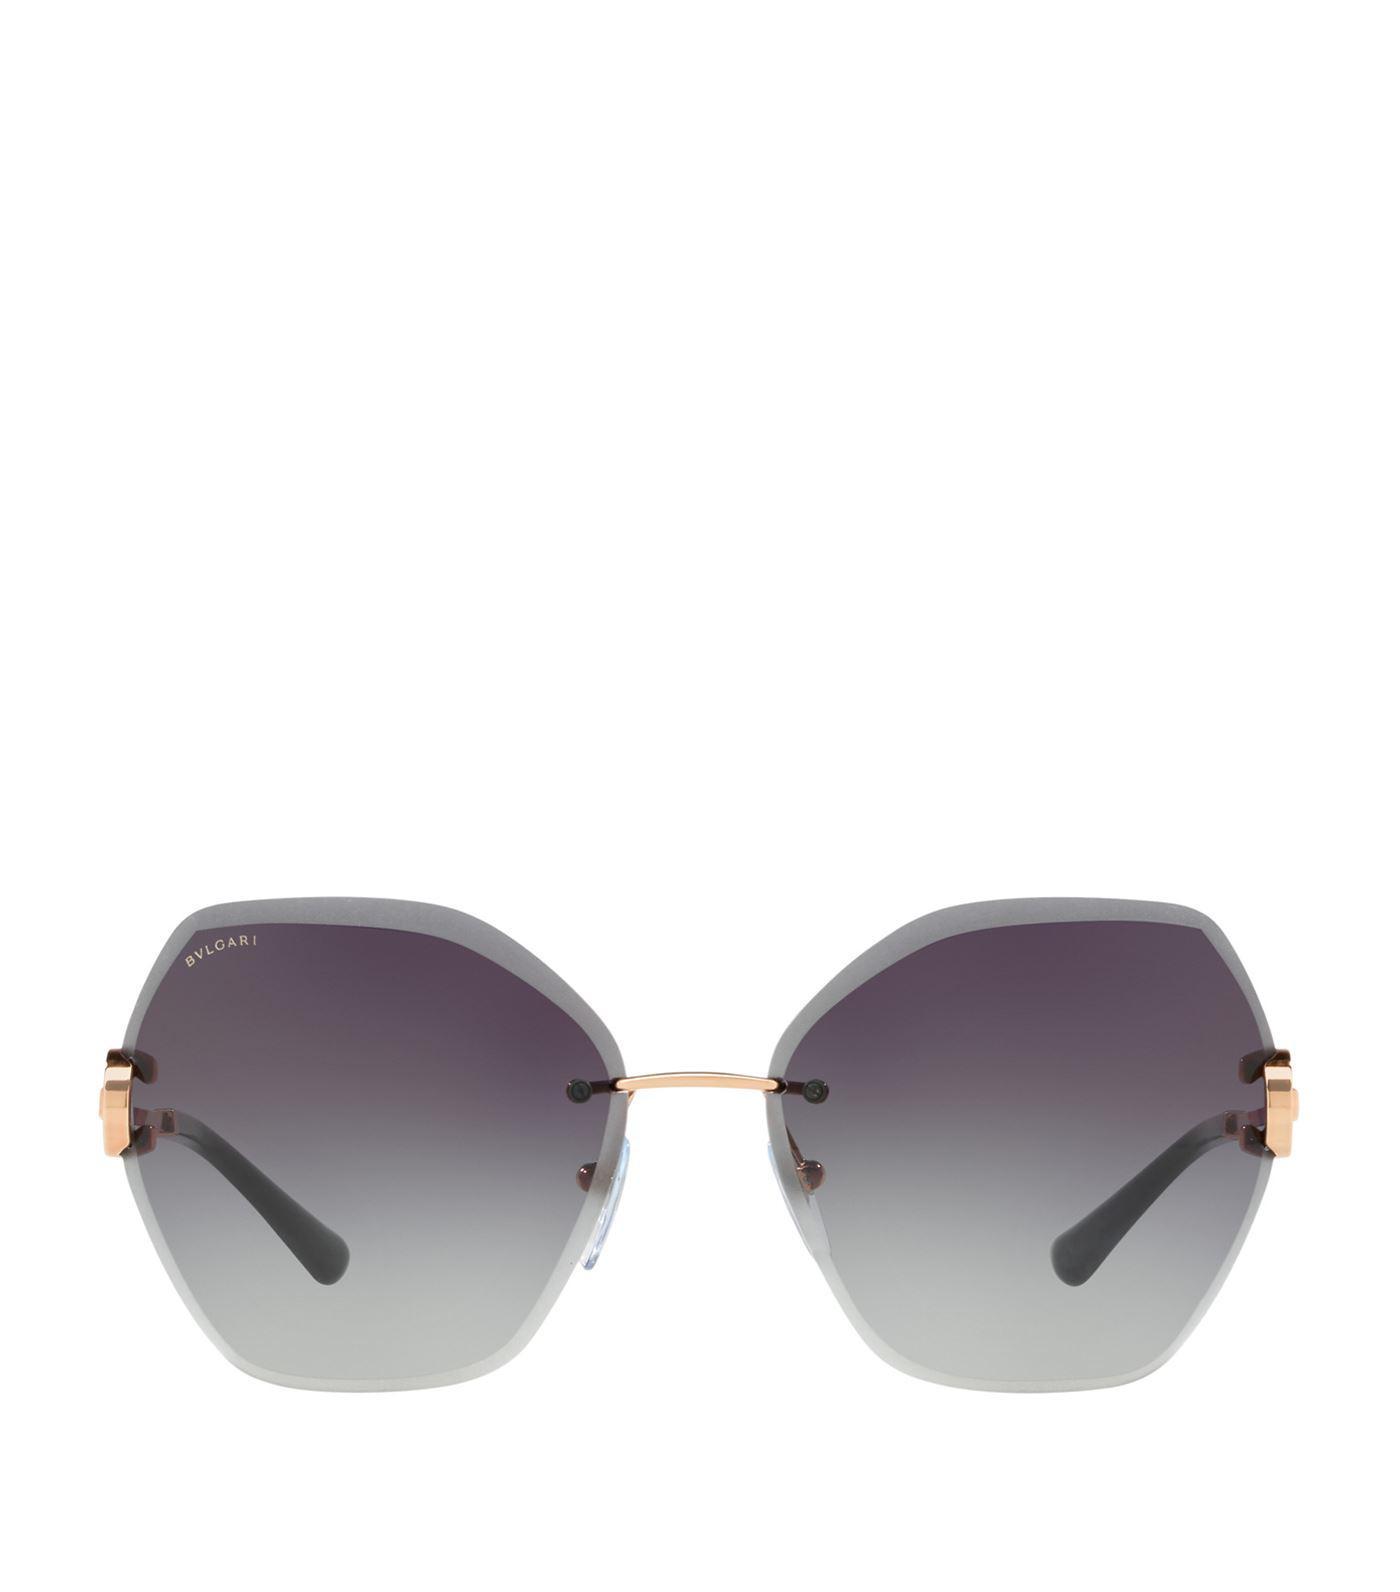 cb7baadbe5584 BVLGARI - Gray Serpenti Gradient Sunglasses - Lyst. View fullscreen